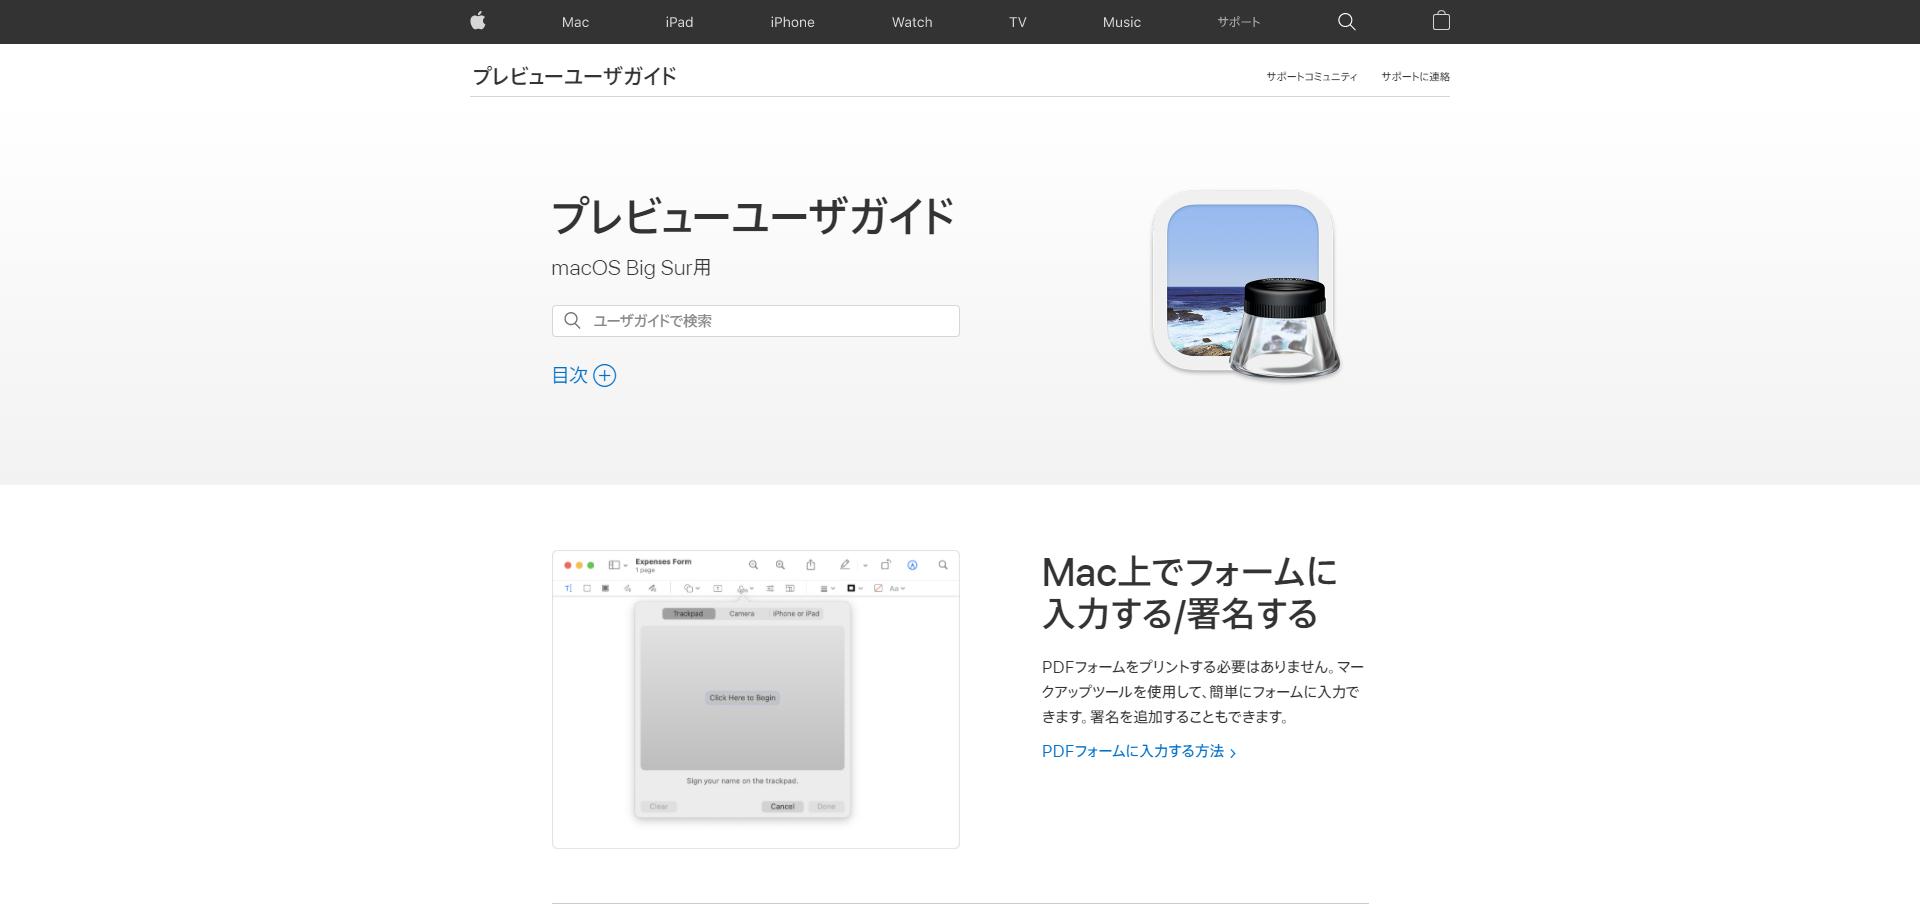 Macのプレビューを利用する